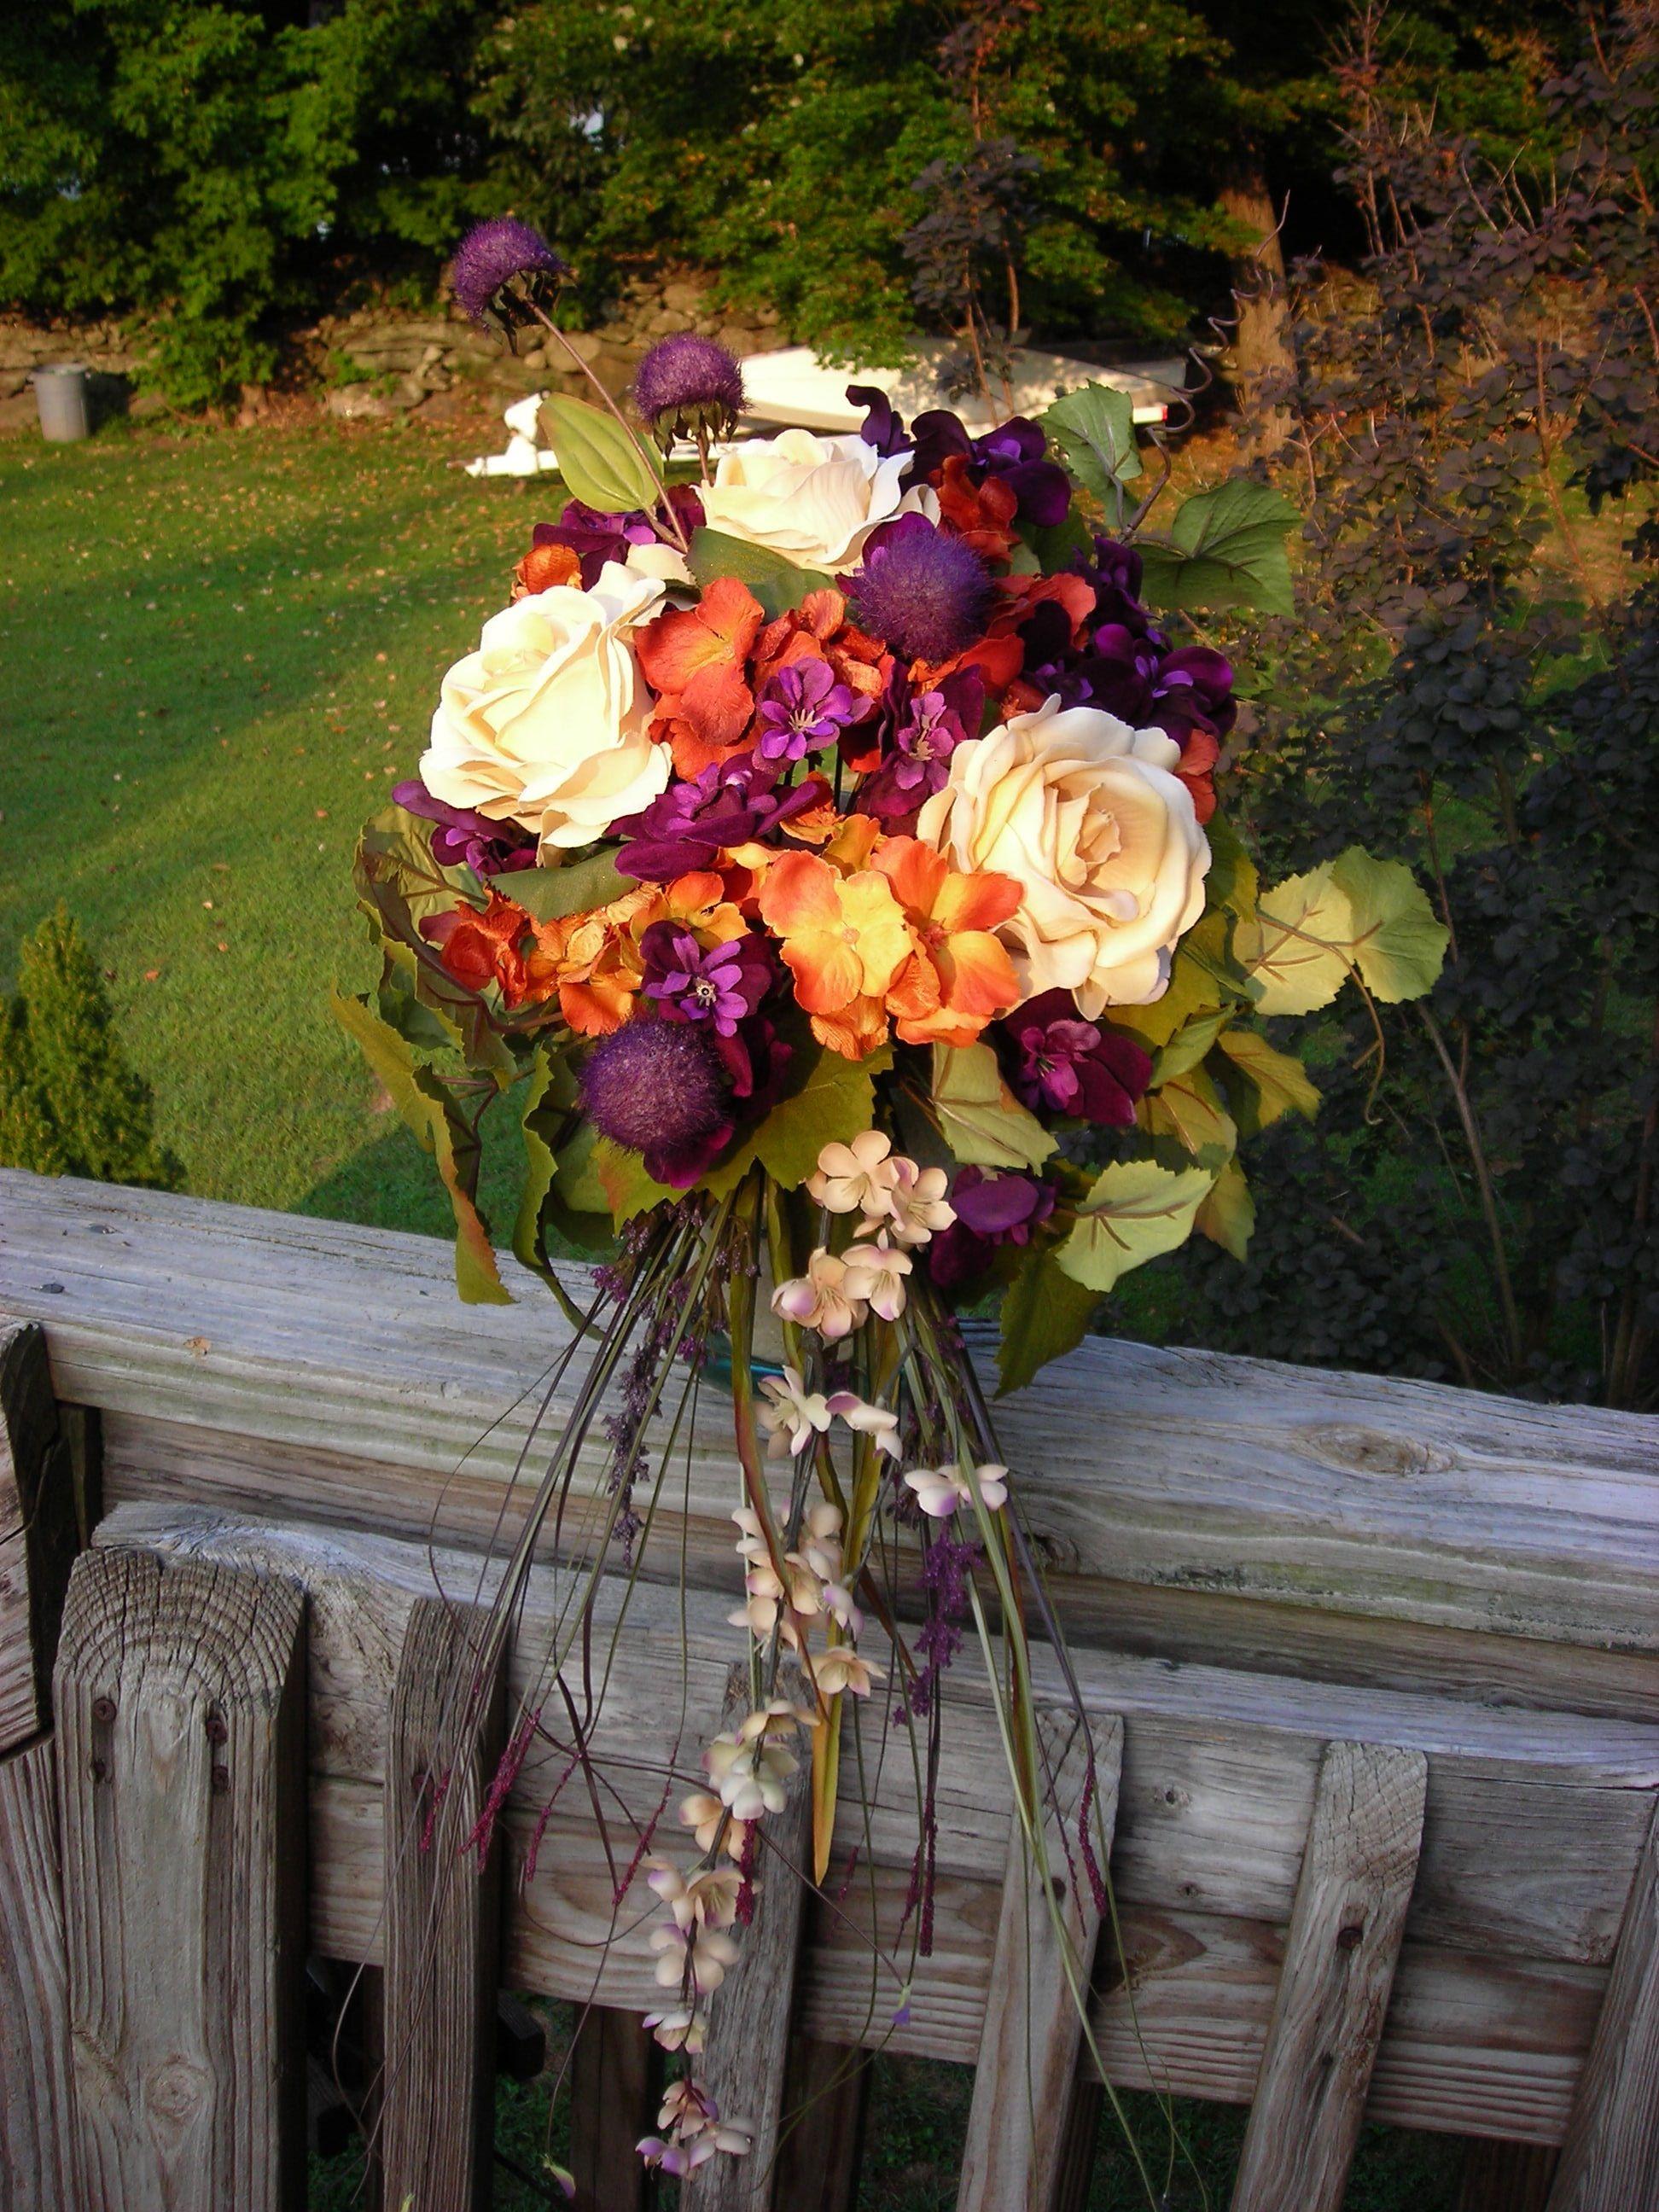 Wedding decorations in uganda  Brides bouquet for a beautiful October weddingmw Ium